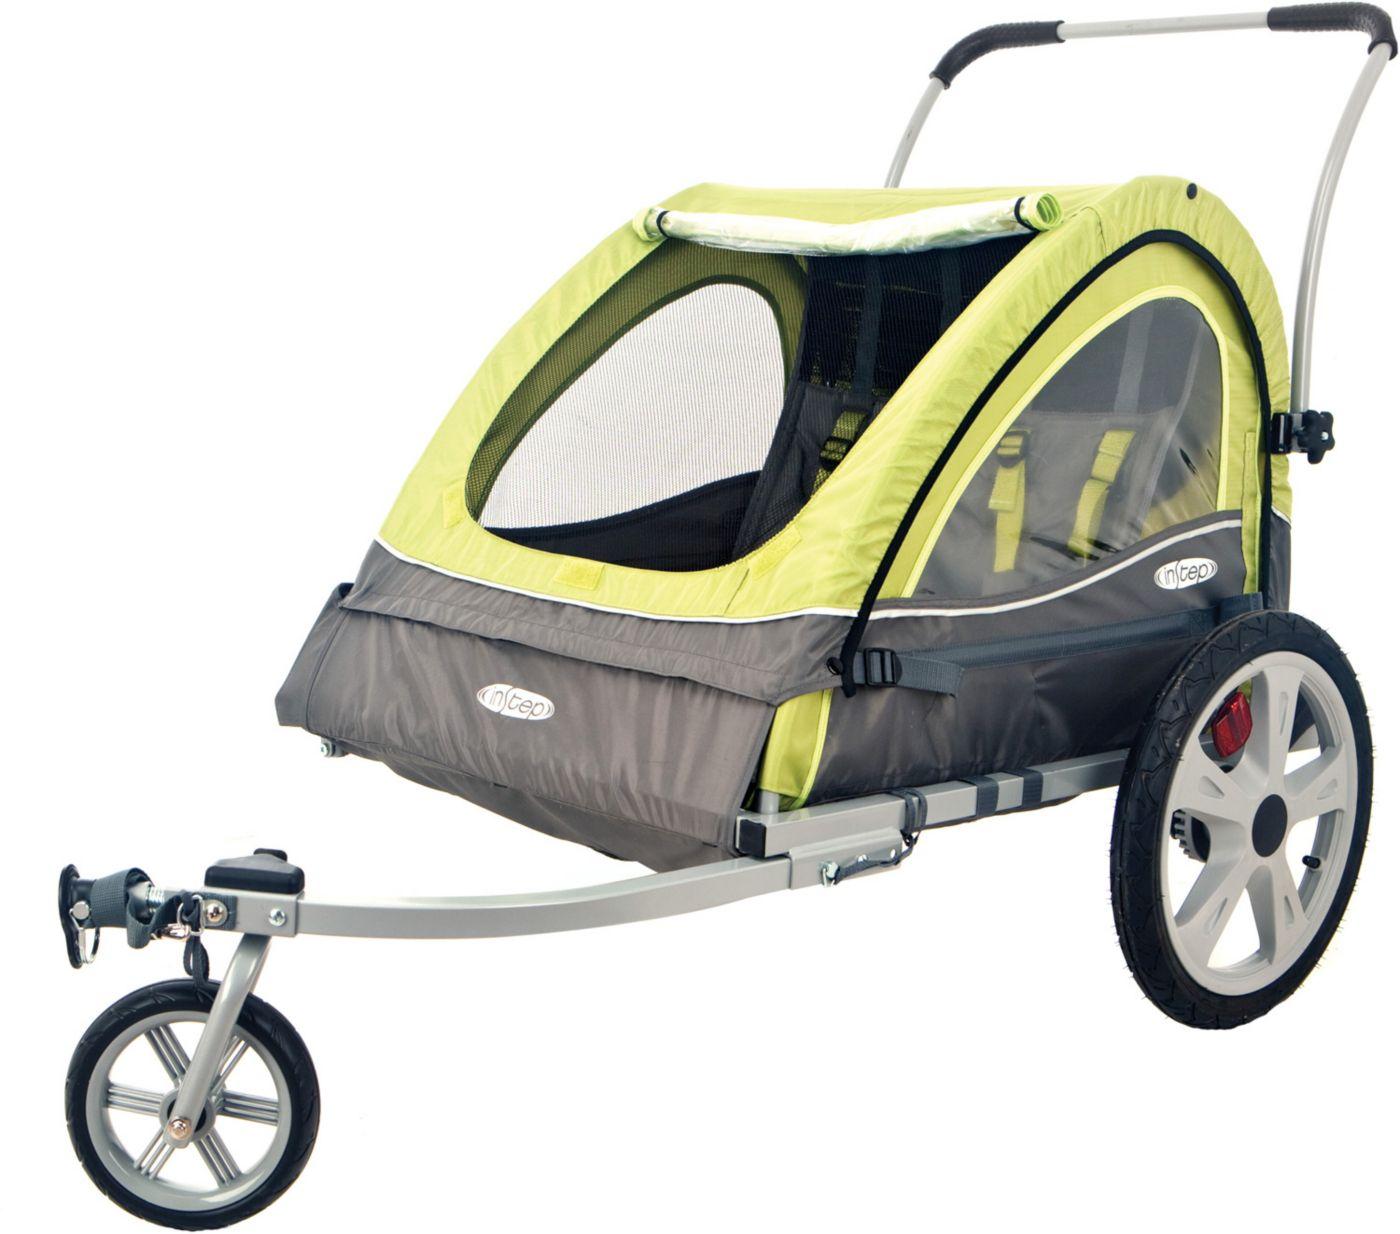 InSTEP Sierra Double Bike Trailer and Stroller